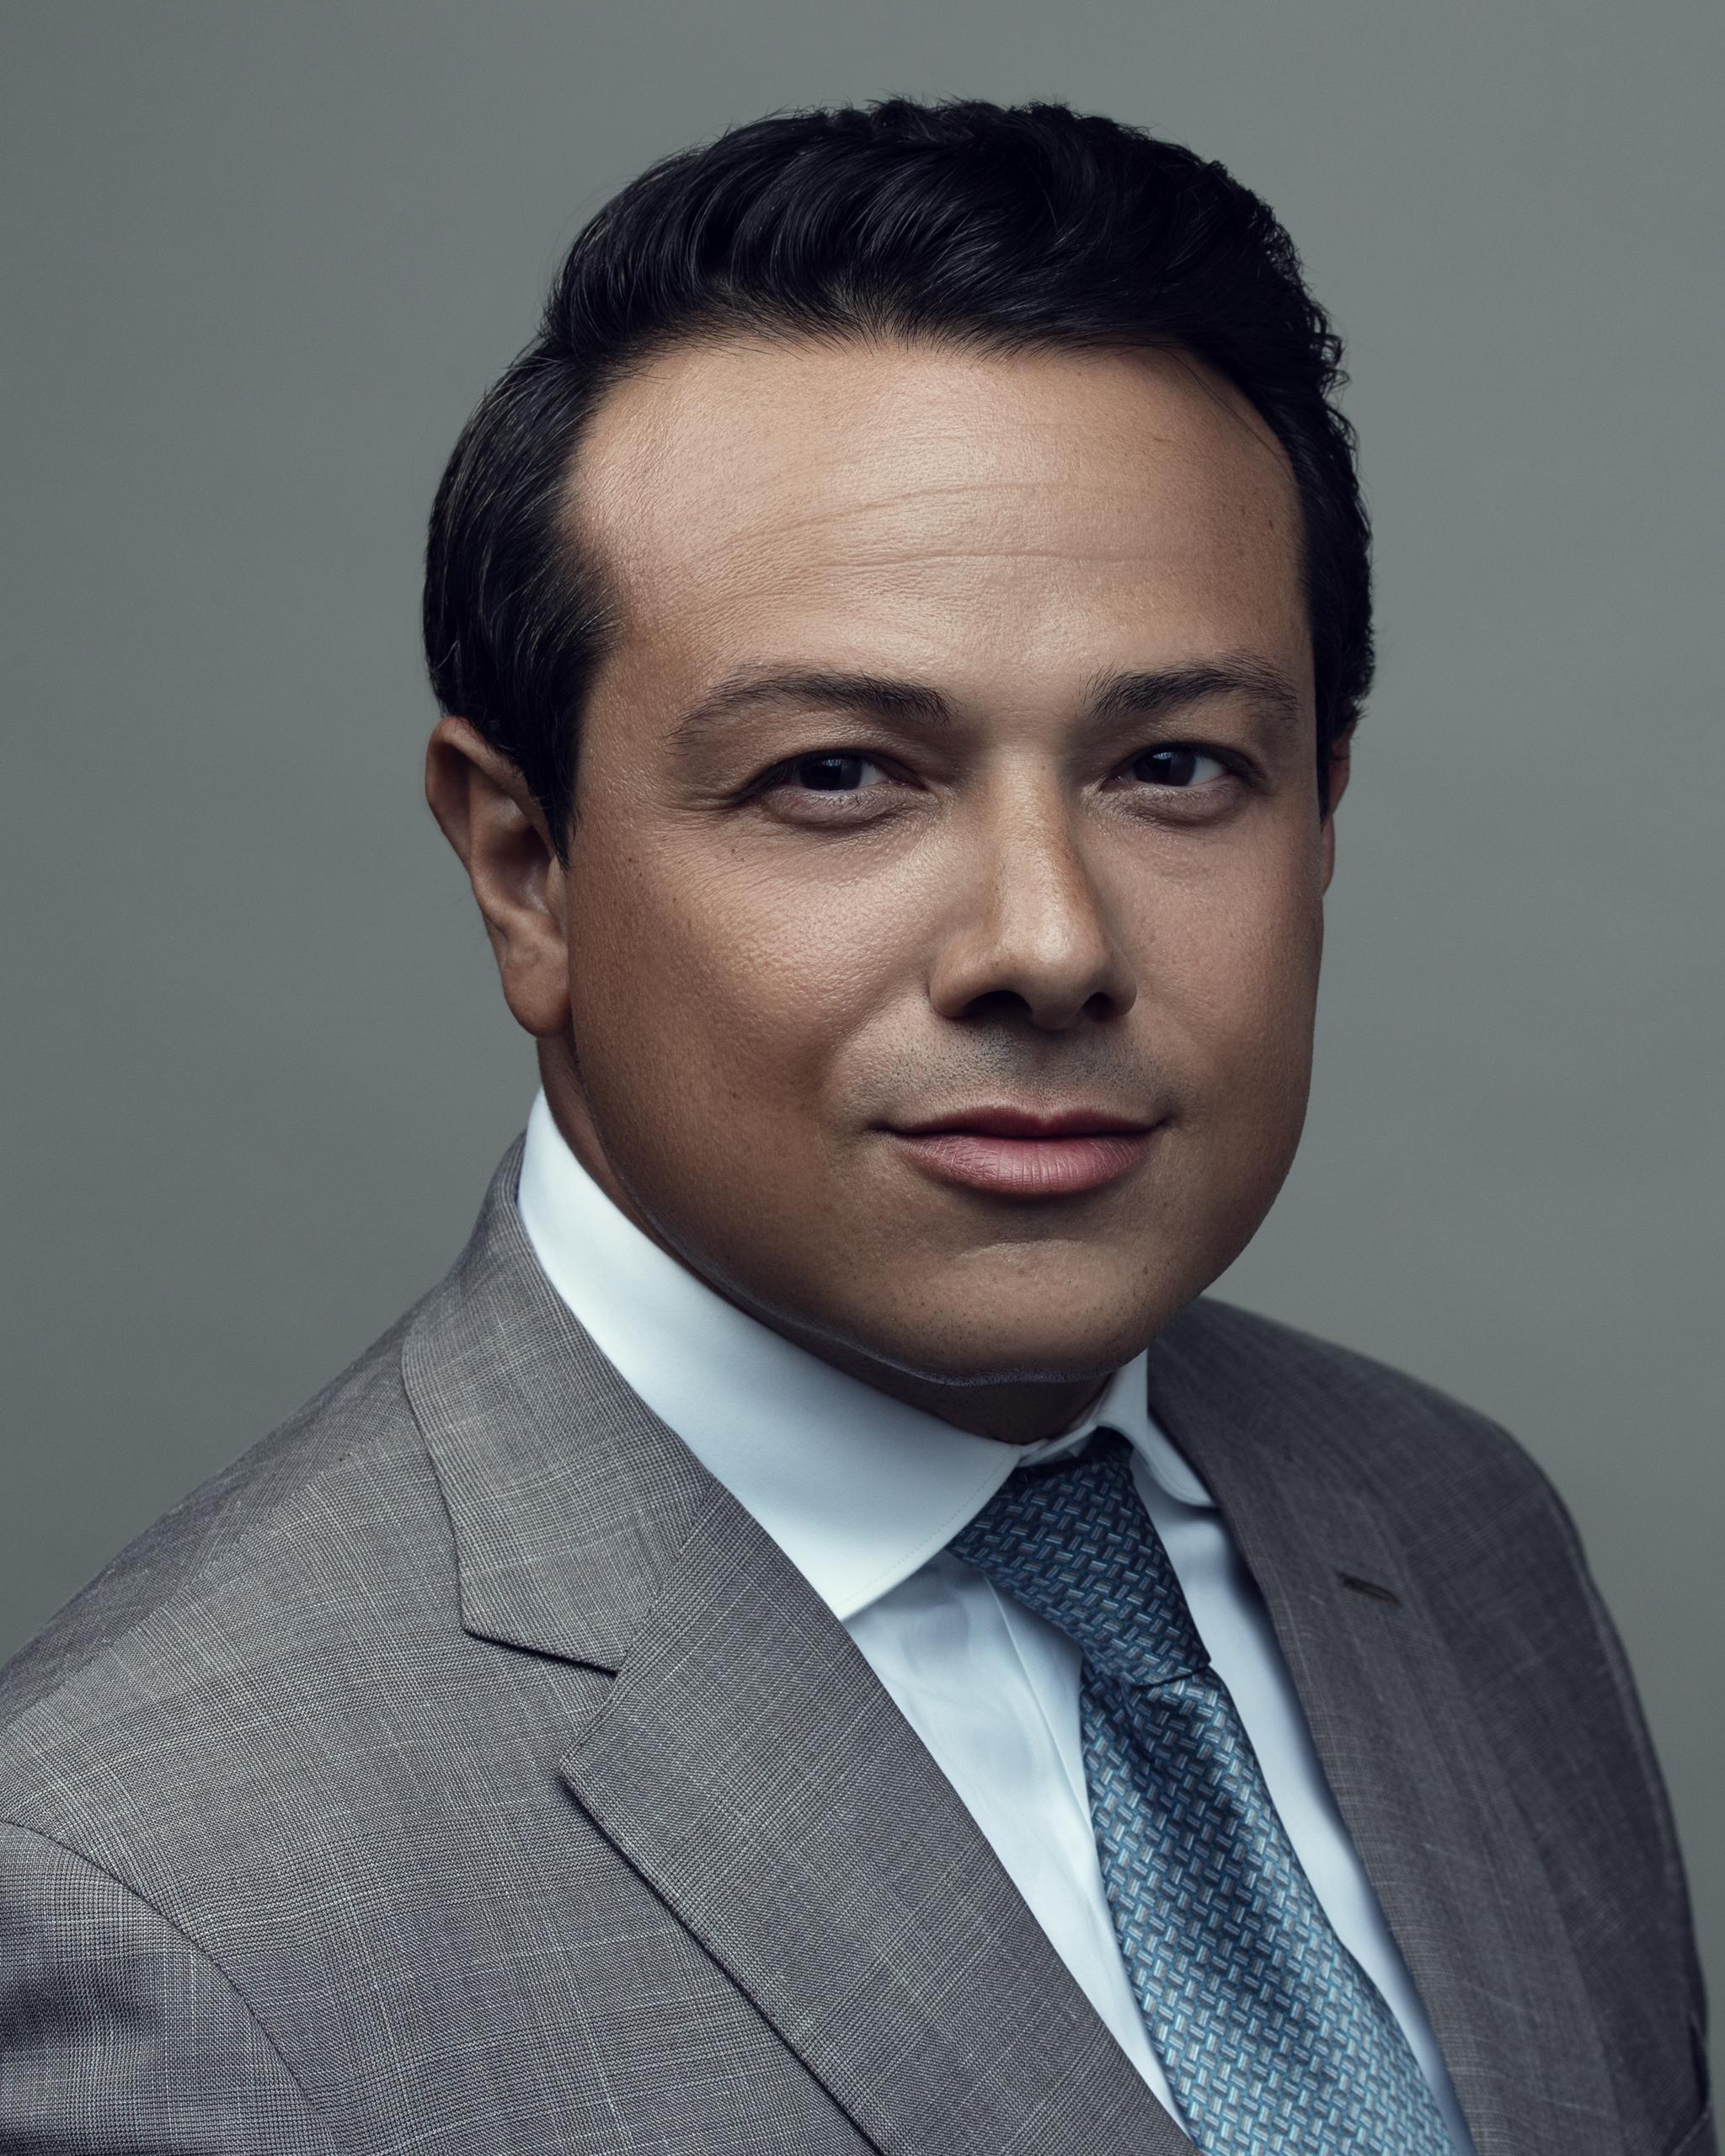 John Lopresti - Morgan Stanley